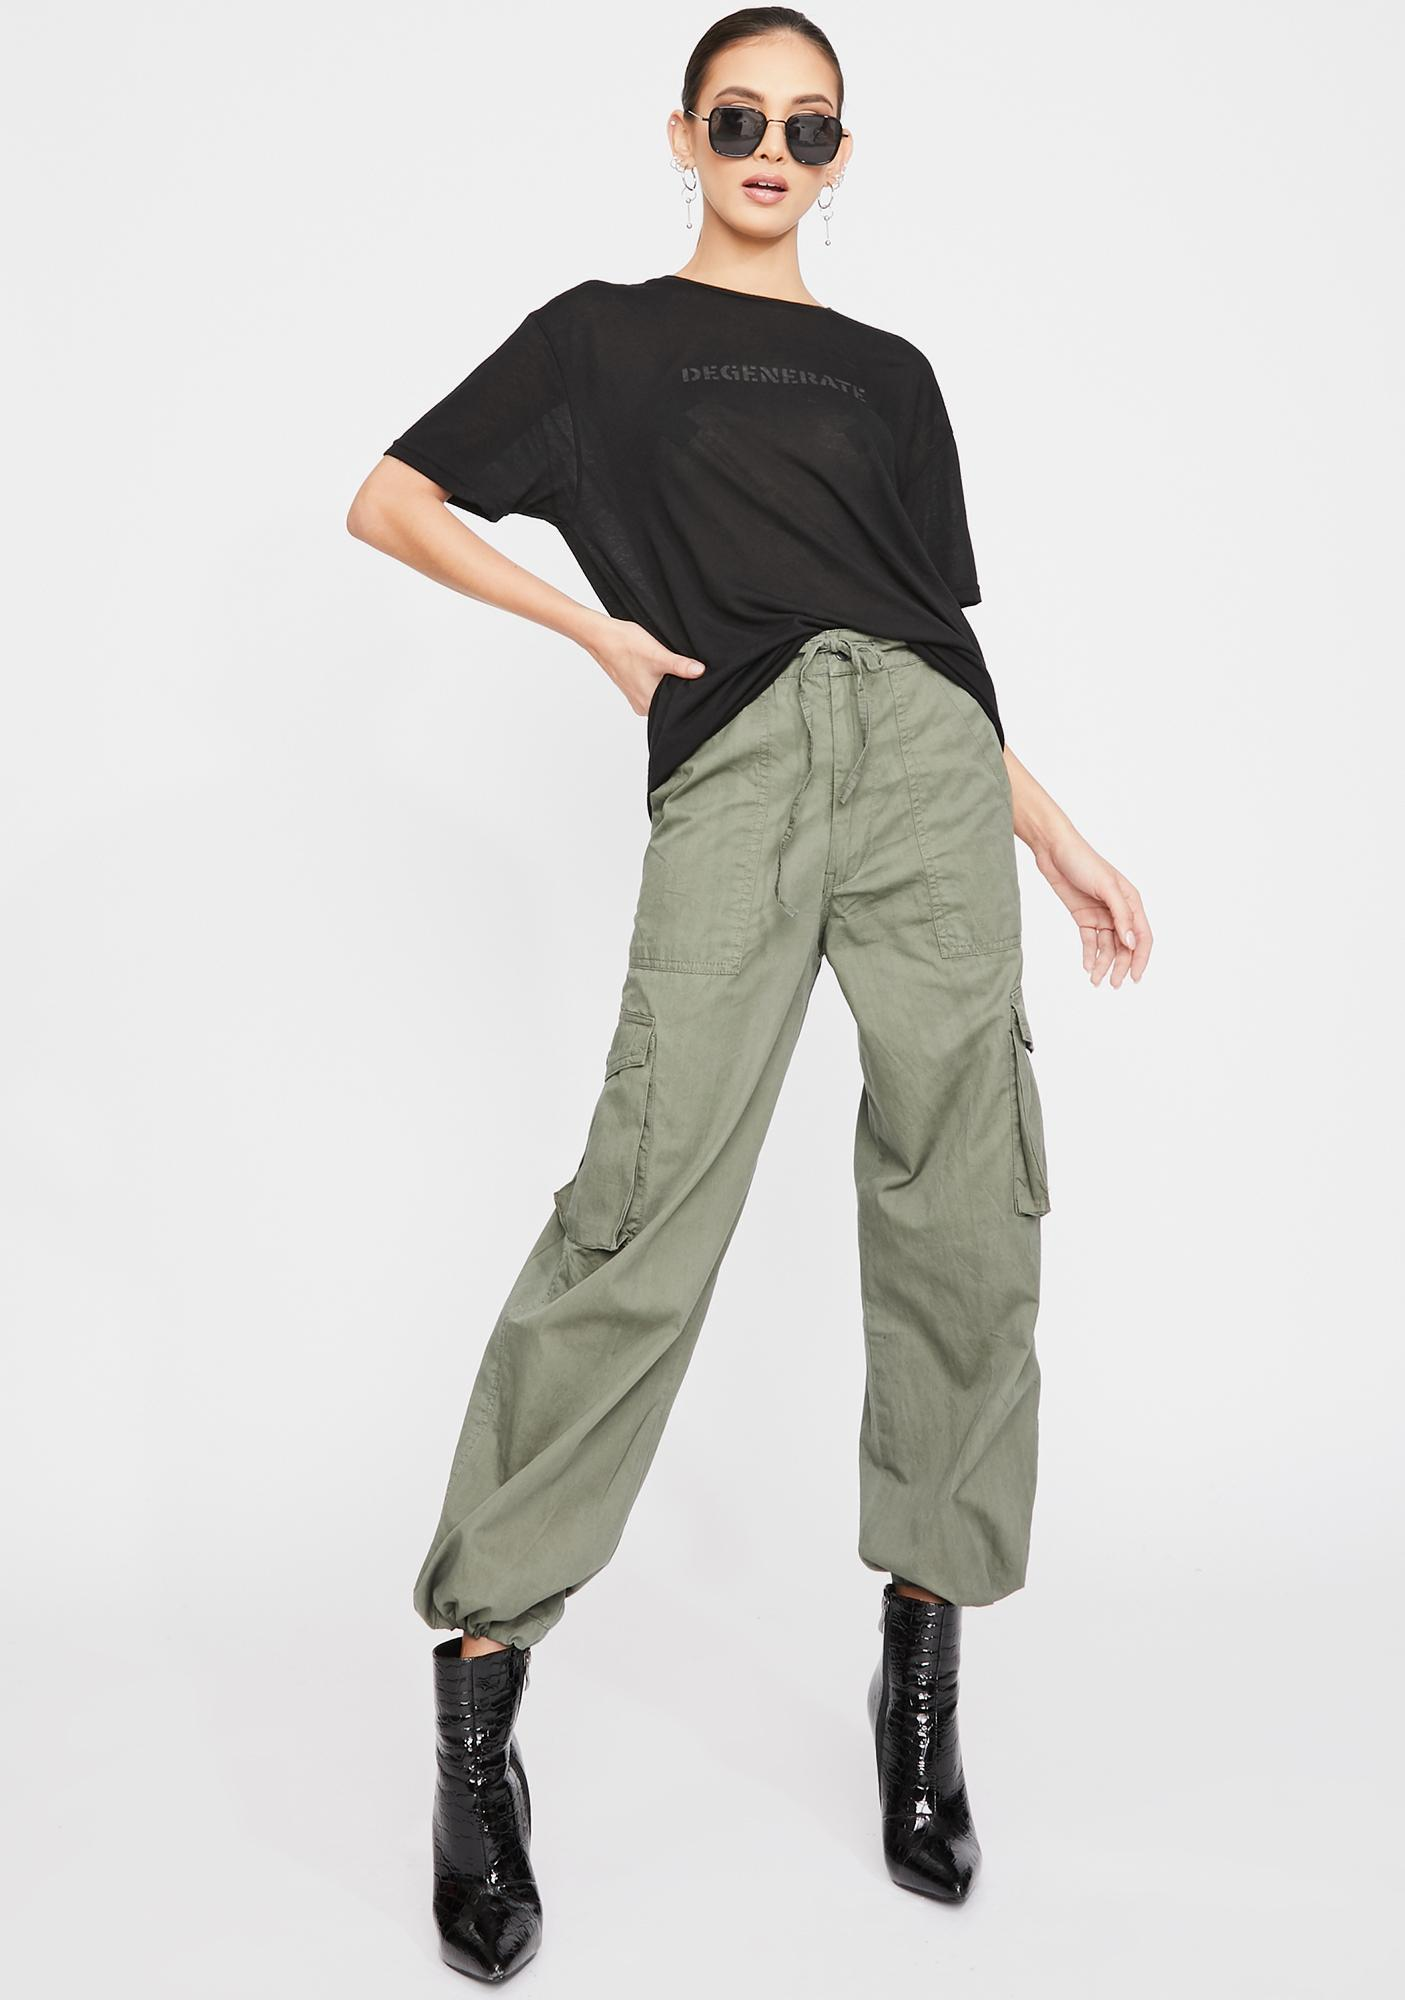 The People VS Surplus Green Cargo Pants